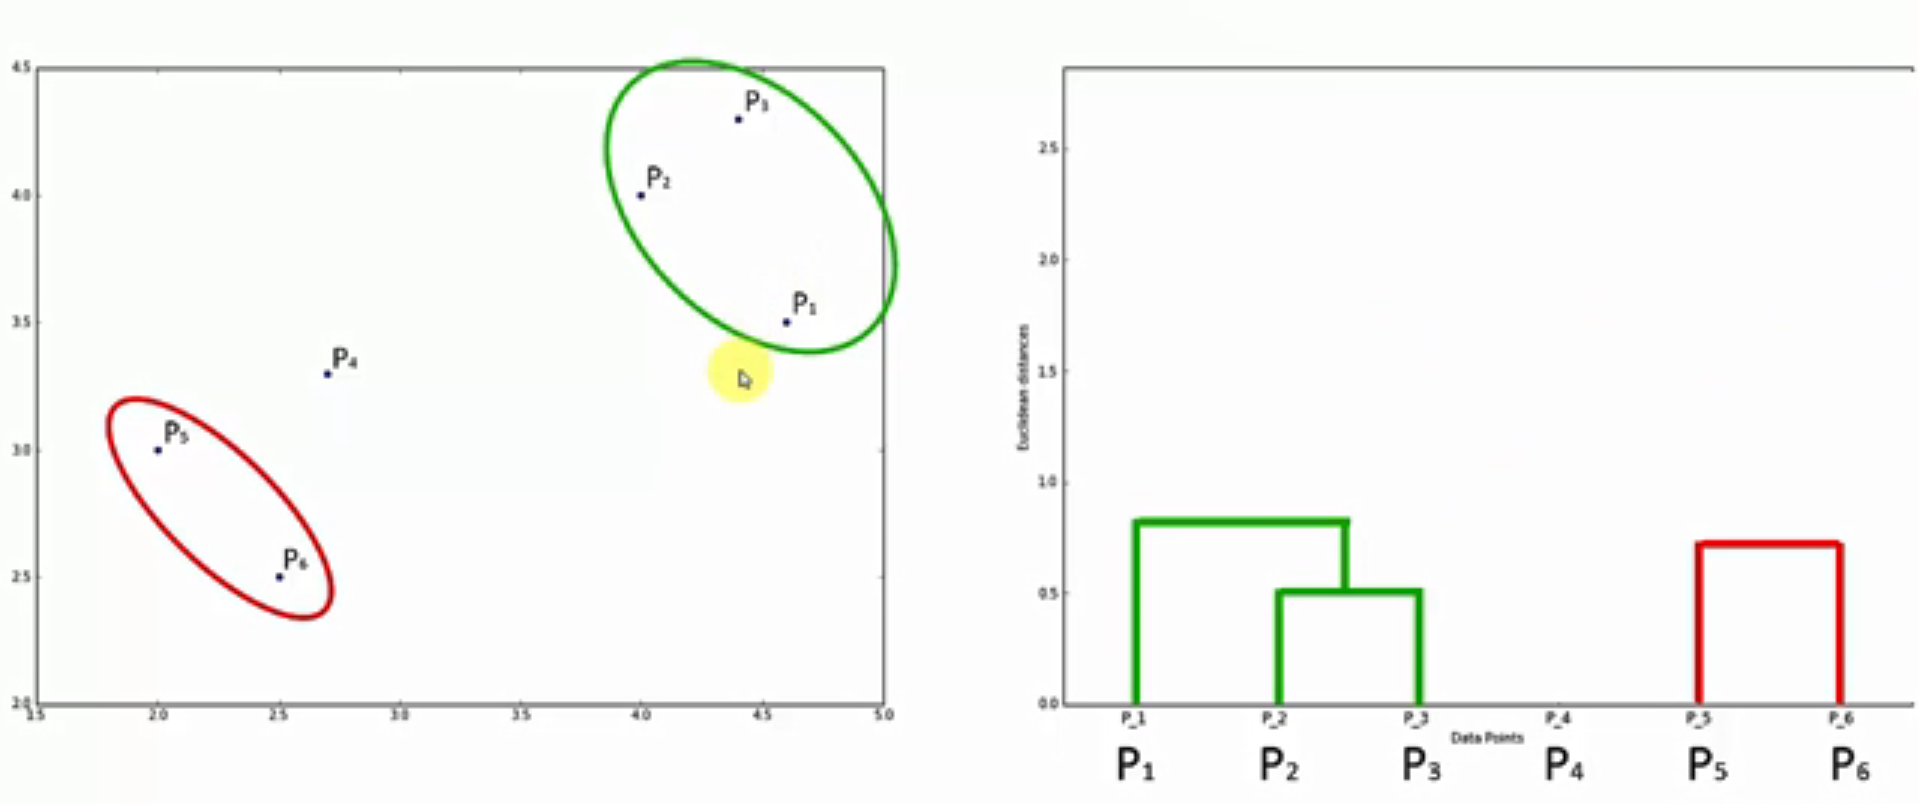 Maschinenlernen: Clusteranalyse mithilfe des Hierarchical Clustering - 1